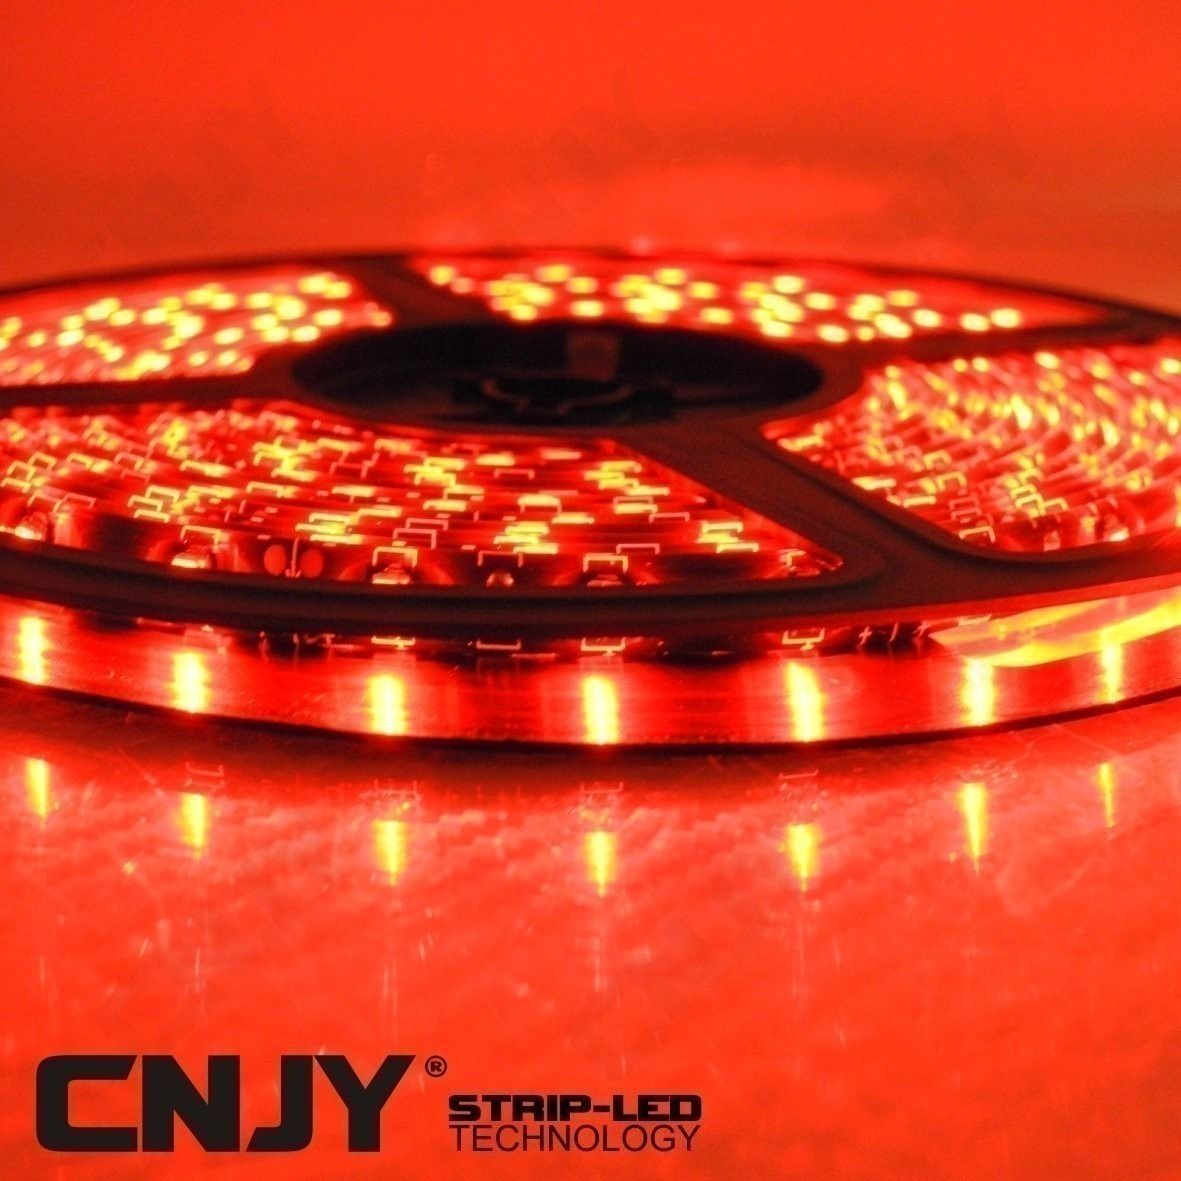 BANDE,LED,FLEXIBLE,STRIP,RUBAN,ROULEAU, DECORATION,12V,BAR,LED,DEL,SMD,ETANCHE,AQUARIUM,TUNING, ROUGE